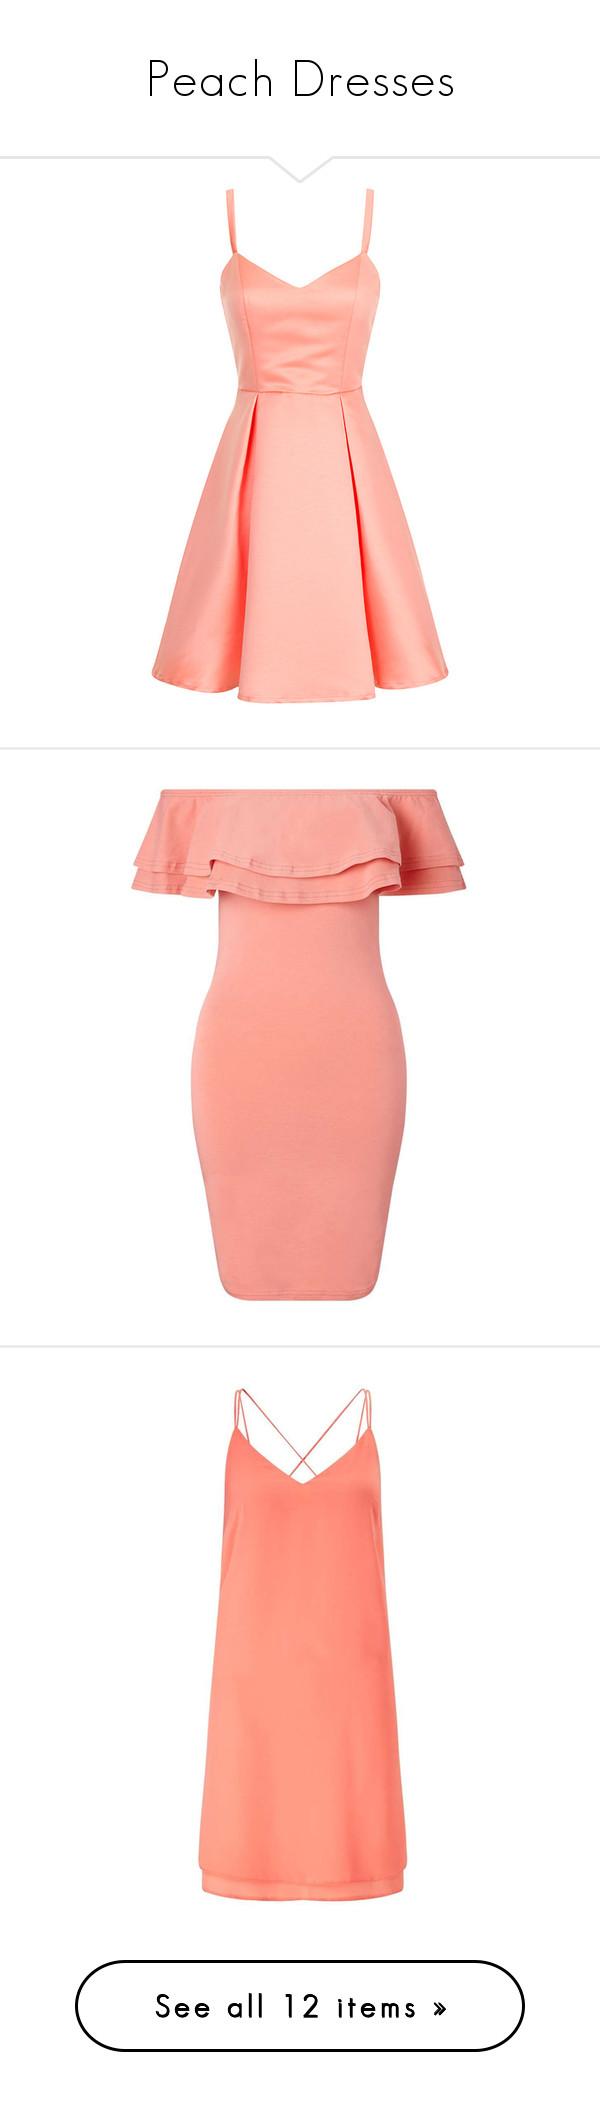 Peach Dresses\